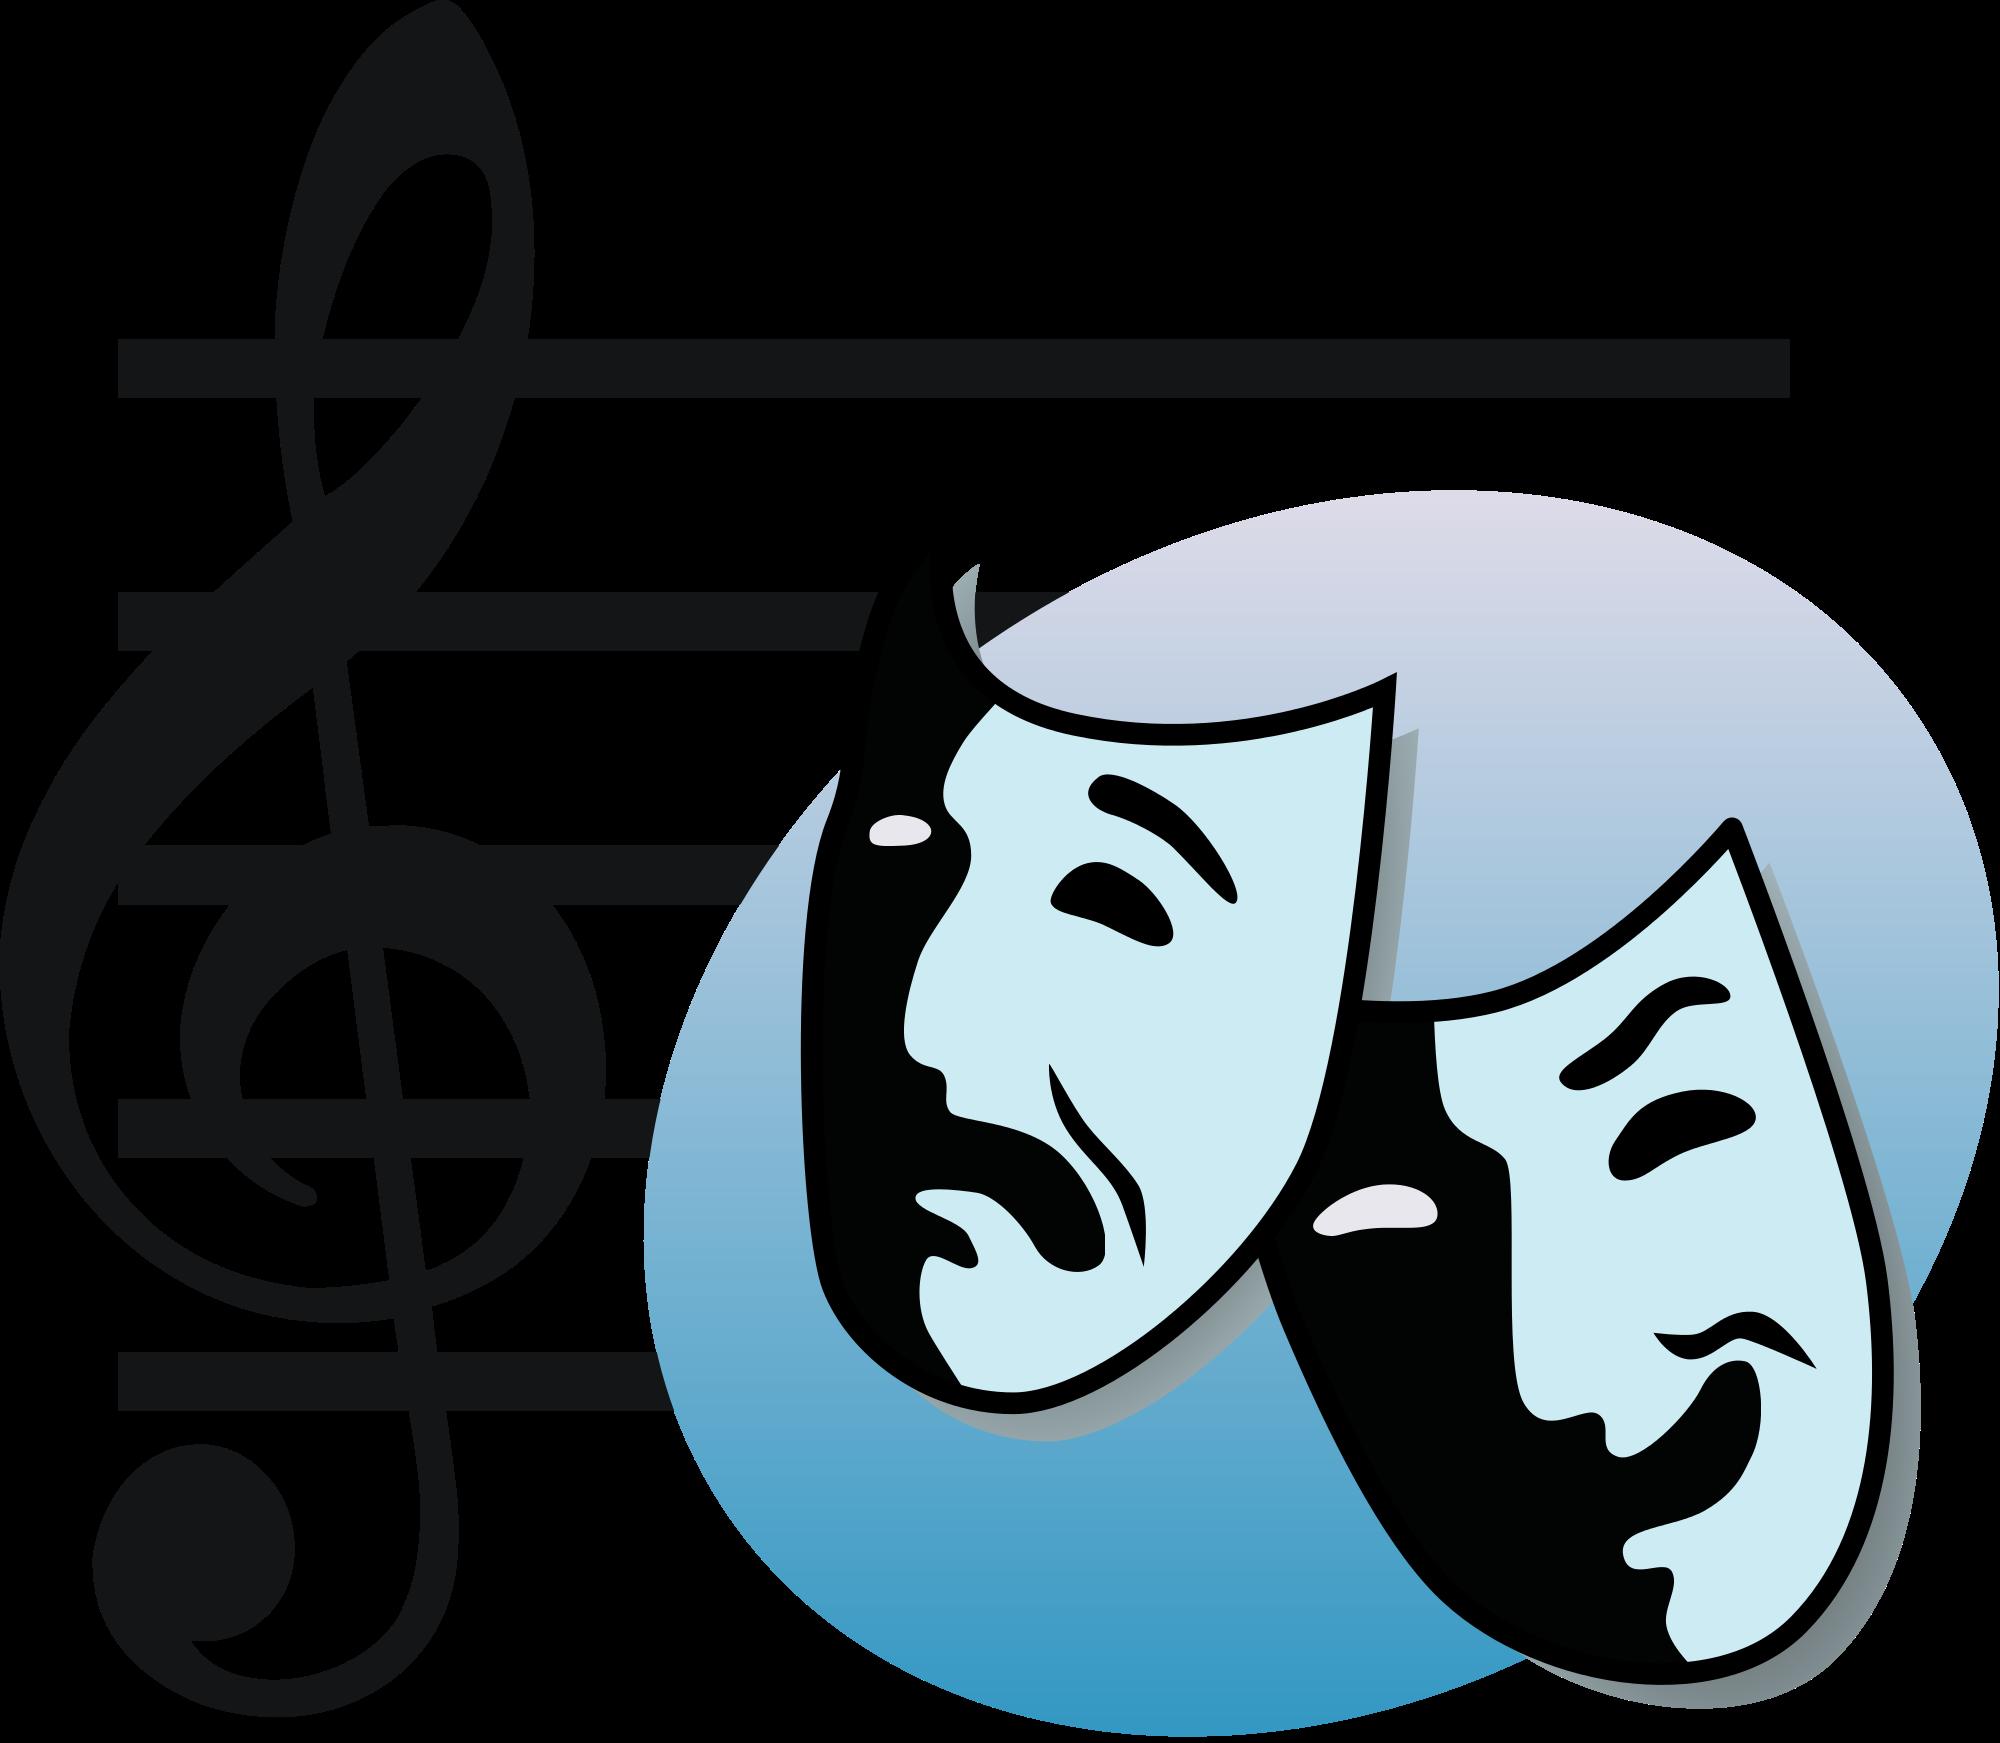 Music clipart music drama. File mtlogo svg wikimedia